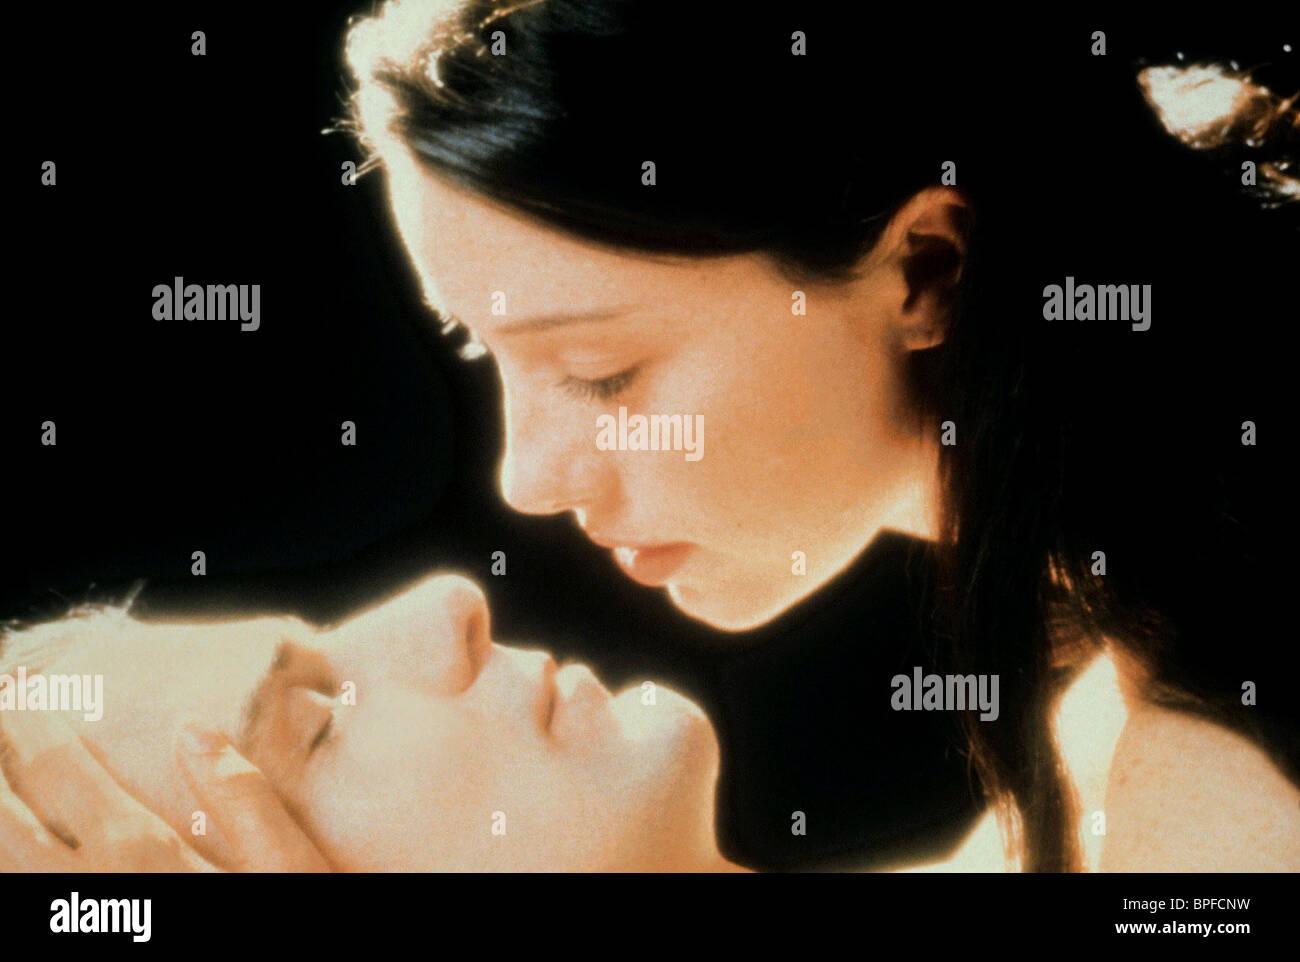 kissed lynne stopkewich 1996